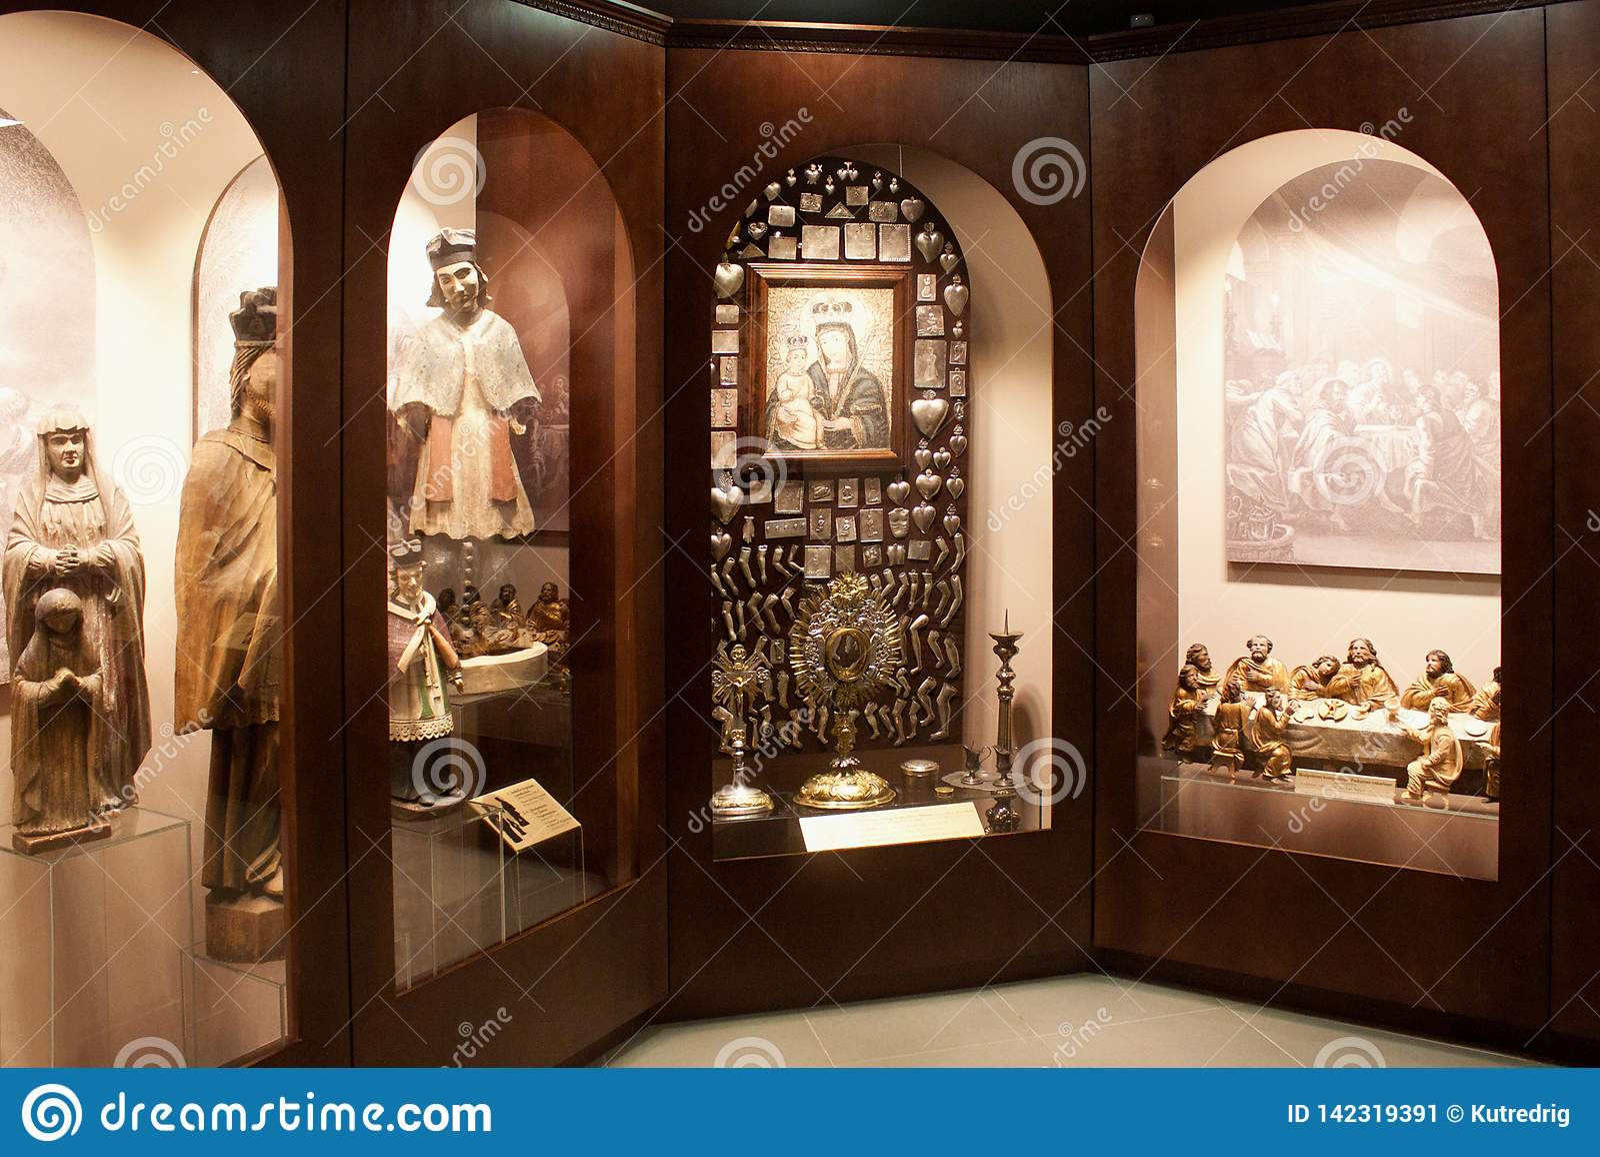 TRAKAI, LITHUANIA - JANUARY 02, 2013: Interior of the Museum of Sacred Art